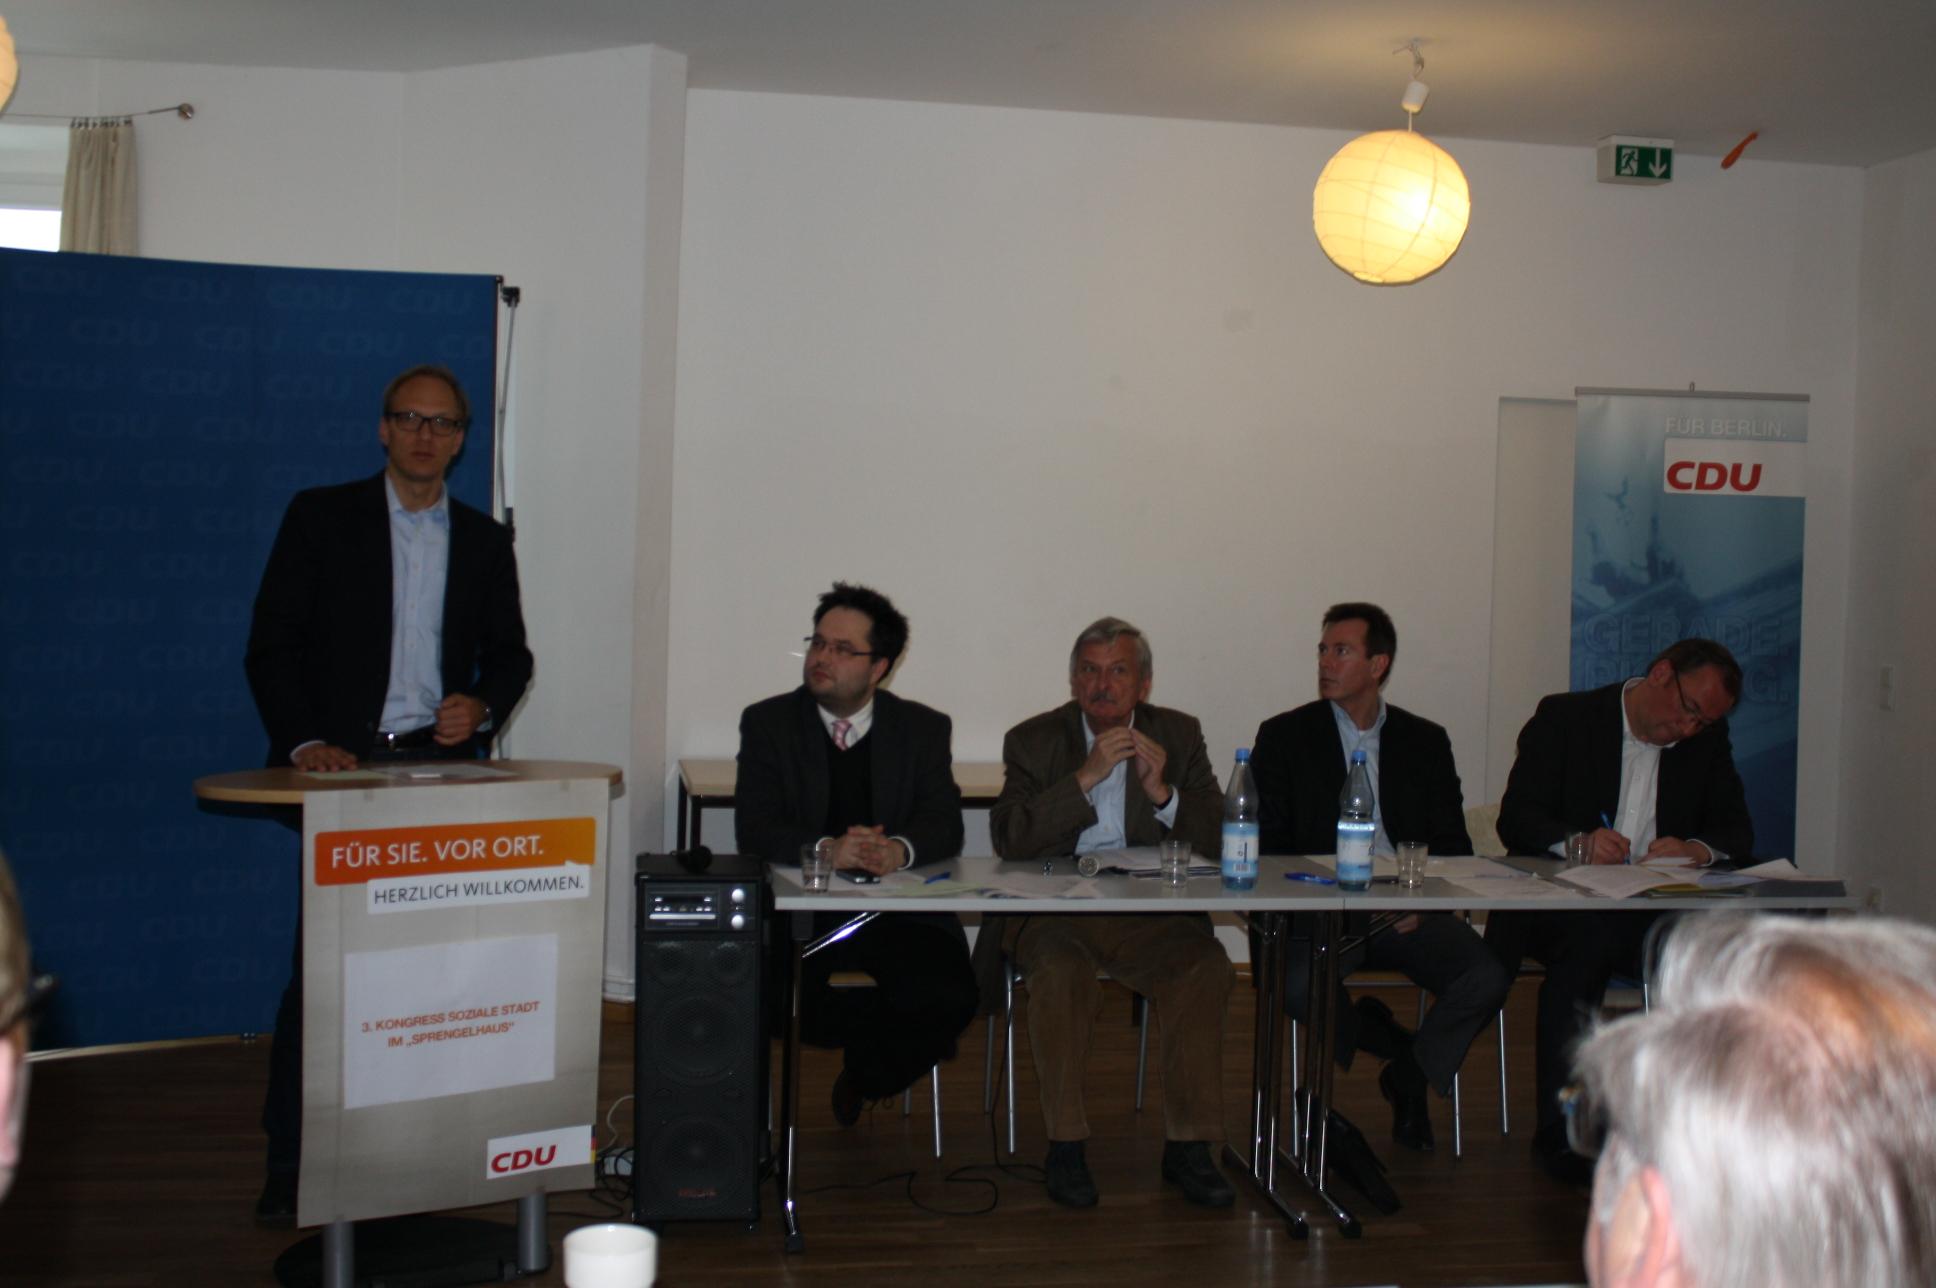 v.l.n.r. Carsten Spallek (Stadtrat), Olaf Lemke (CDA Kreisvorsitzender), Volker Liepelt (stellv. CDU Kreisvorsitzender), Michael Büge (Staatssekretär), Thorsten Reschke (Fraktionsvorsitzender)